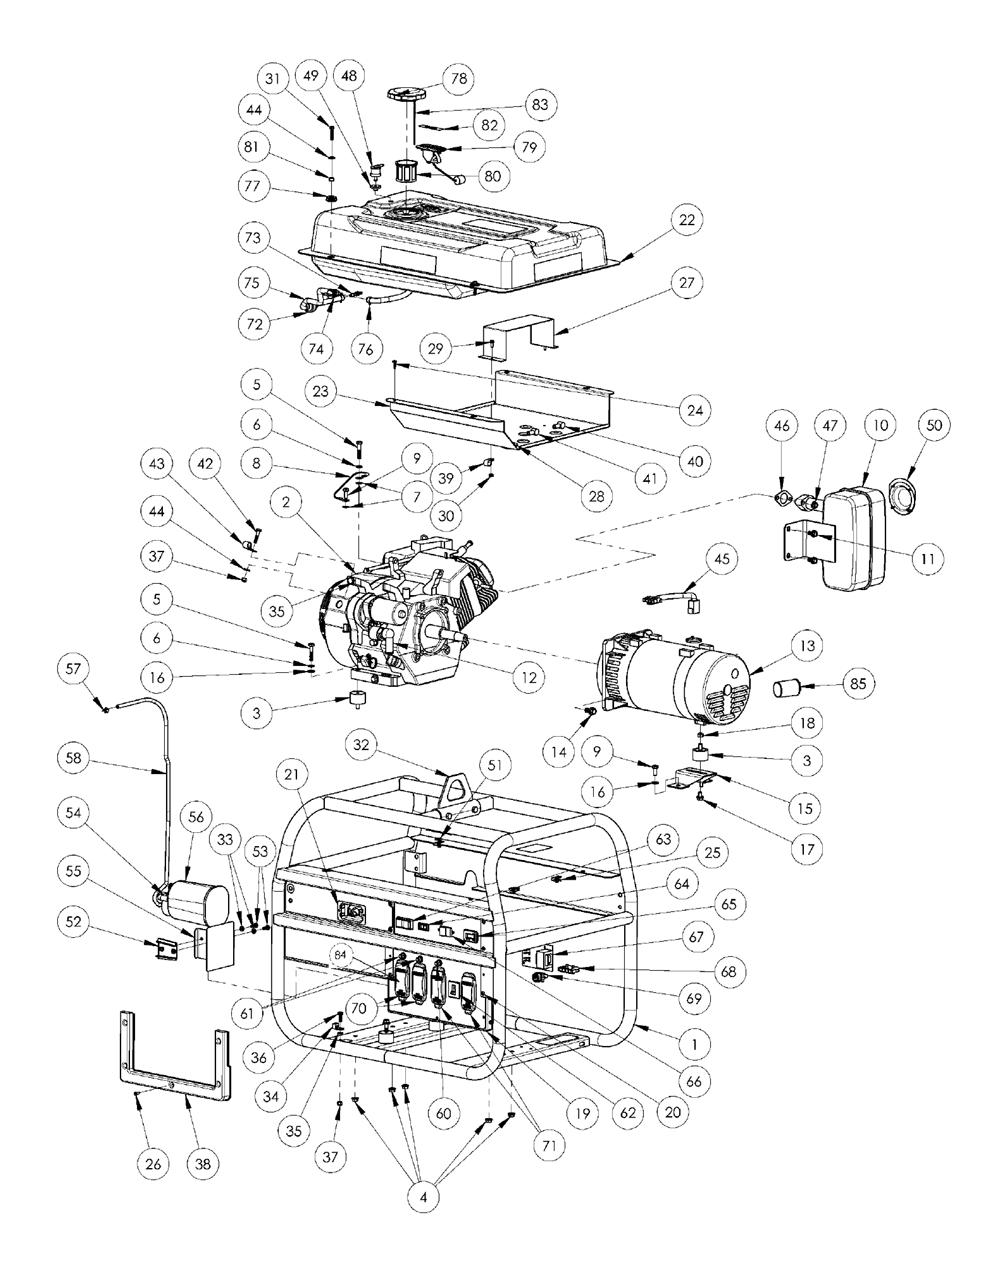 dewalt dxgn7200